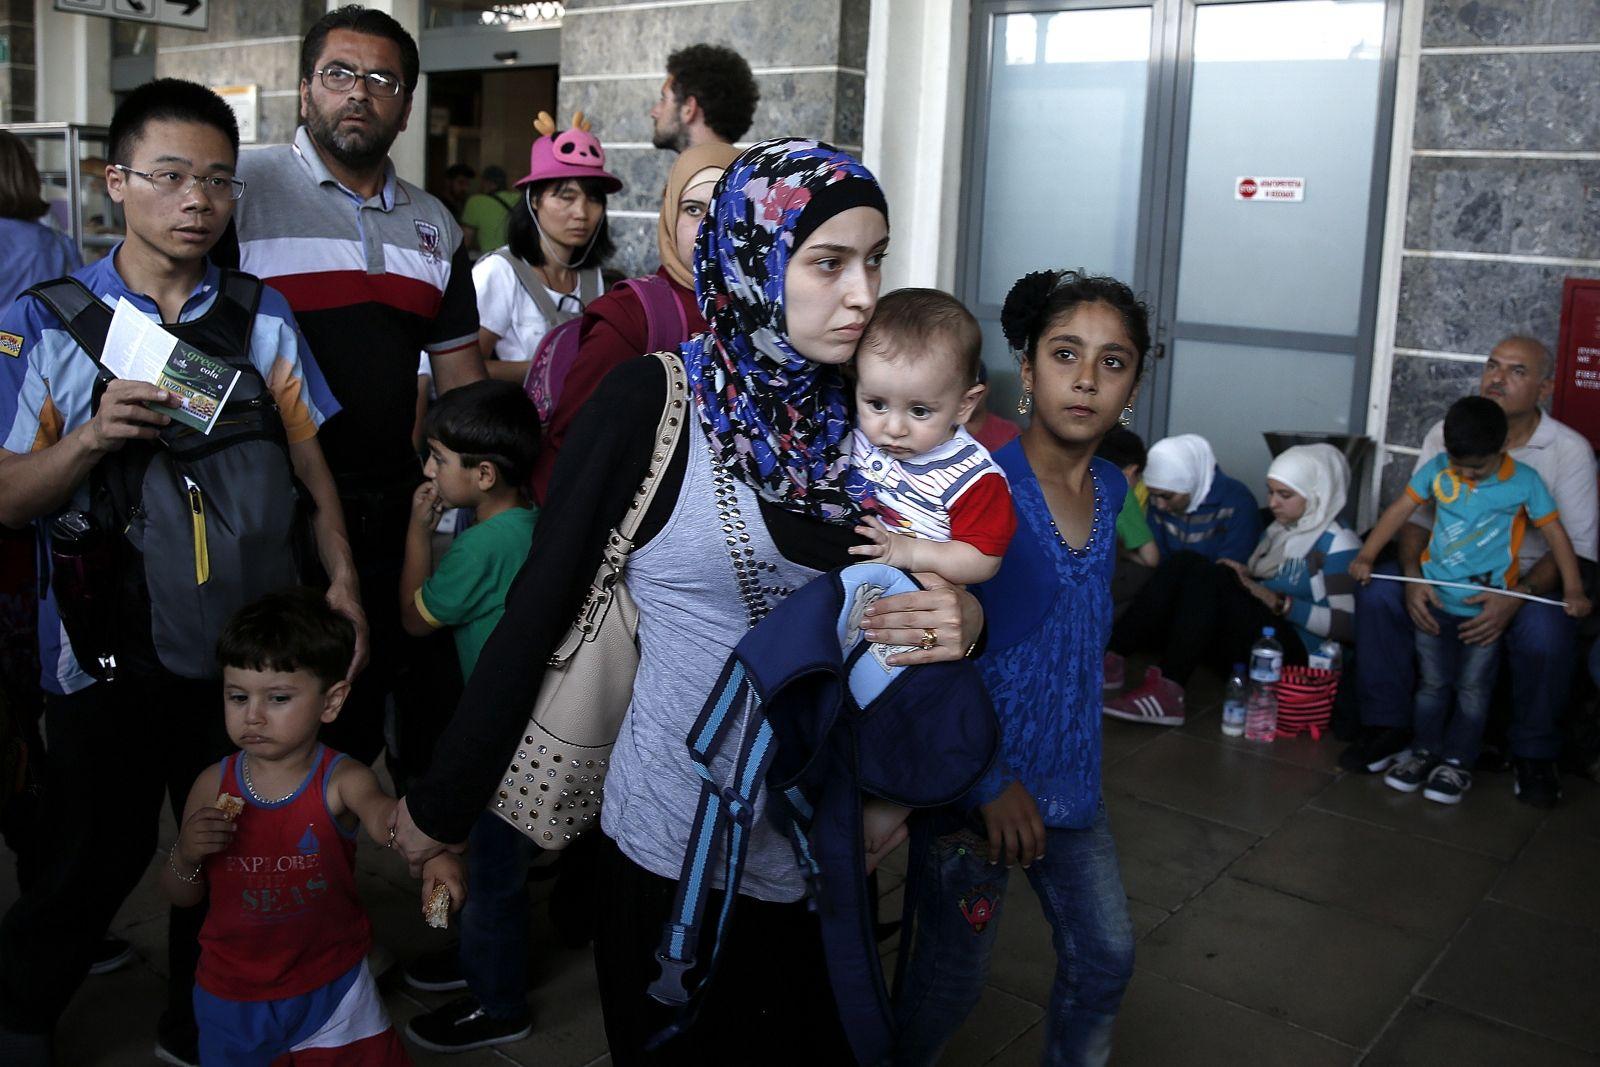 Slovakia Christian asylum seekers